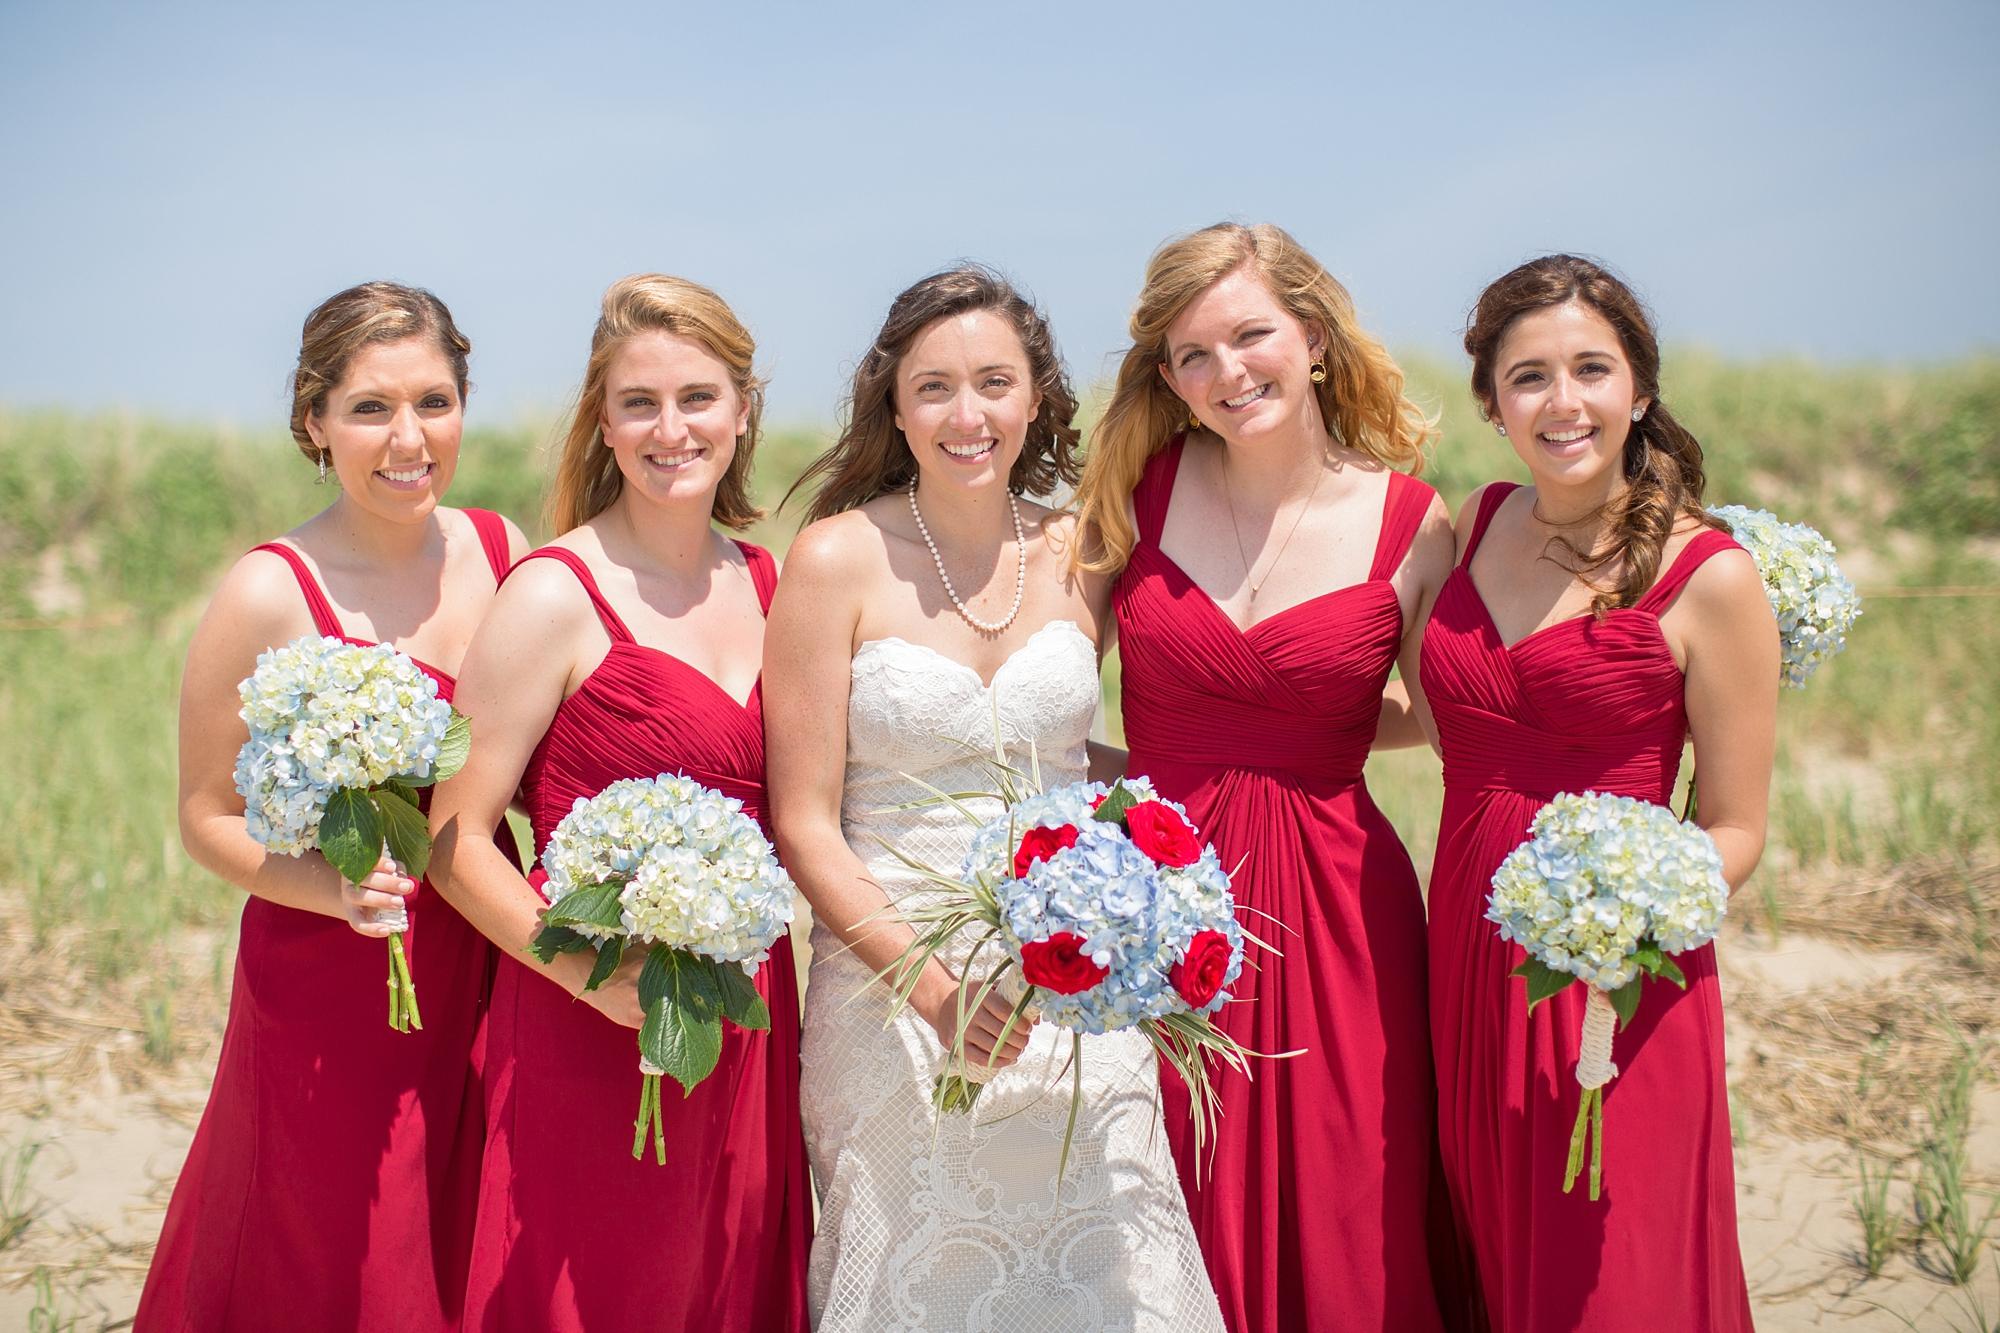 Goodman 4-Bridal Party-328_anna grace photography wellfleet cape cod massachusetts destination wedding photographer Chequessett Yacht and Country Club wedding photo.jpg